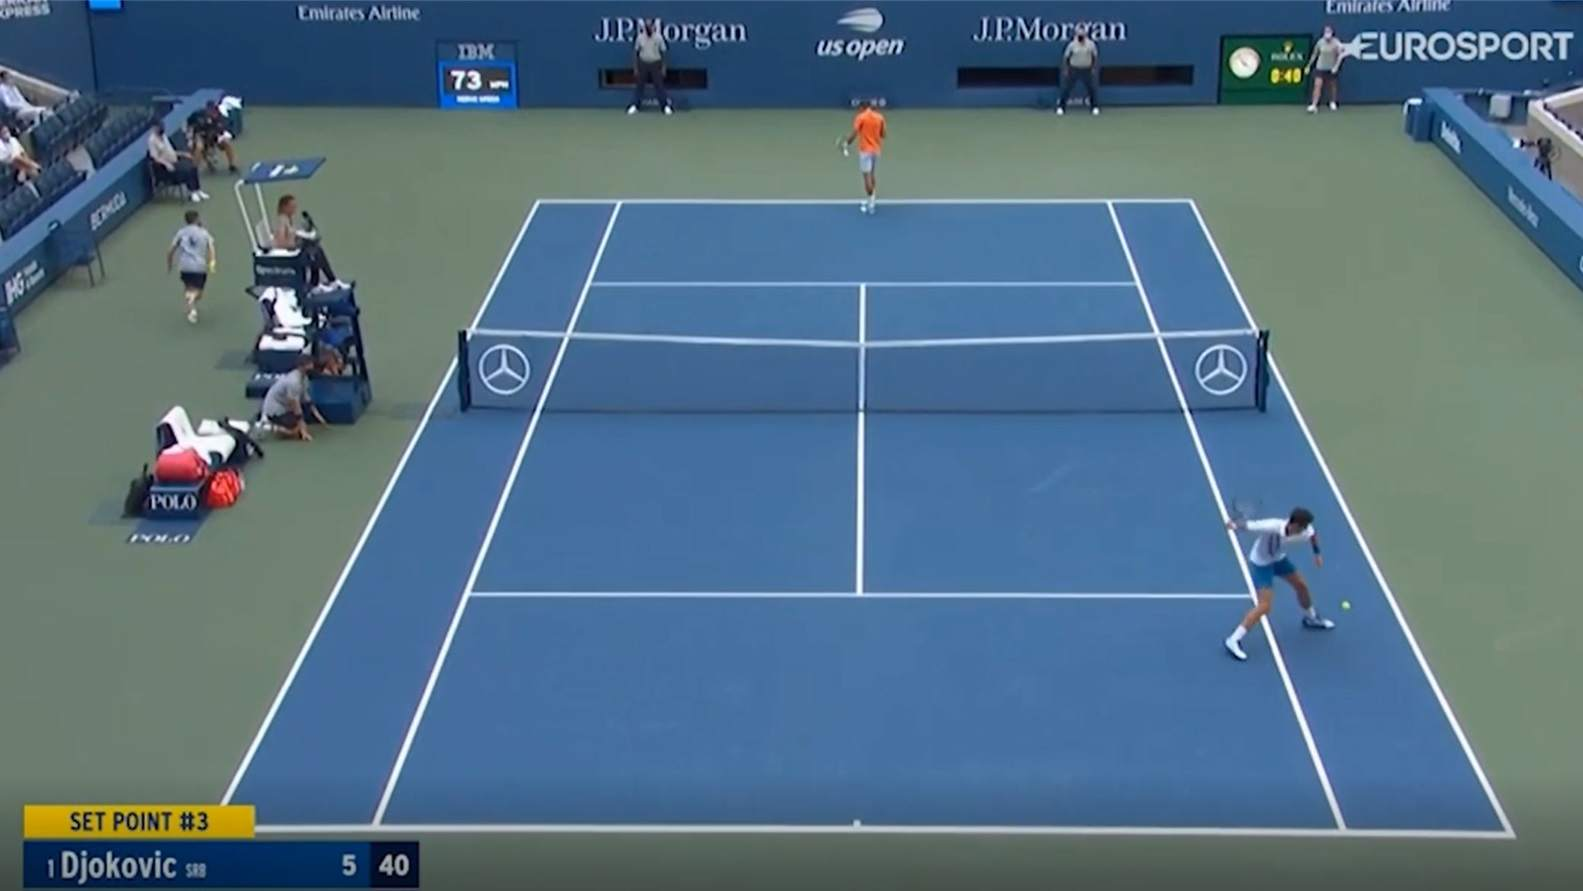 eurosport tennis translyatsii onlajn